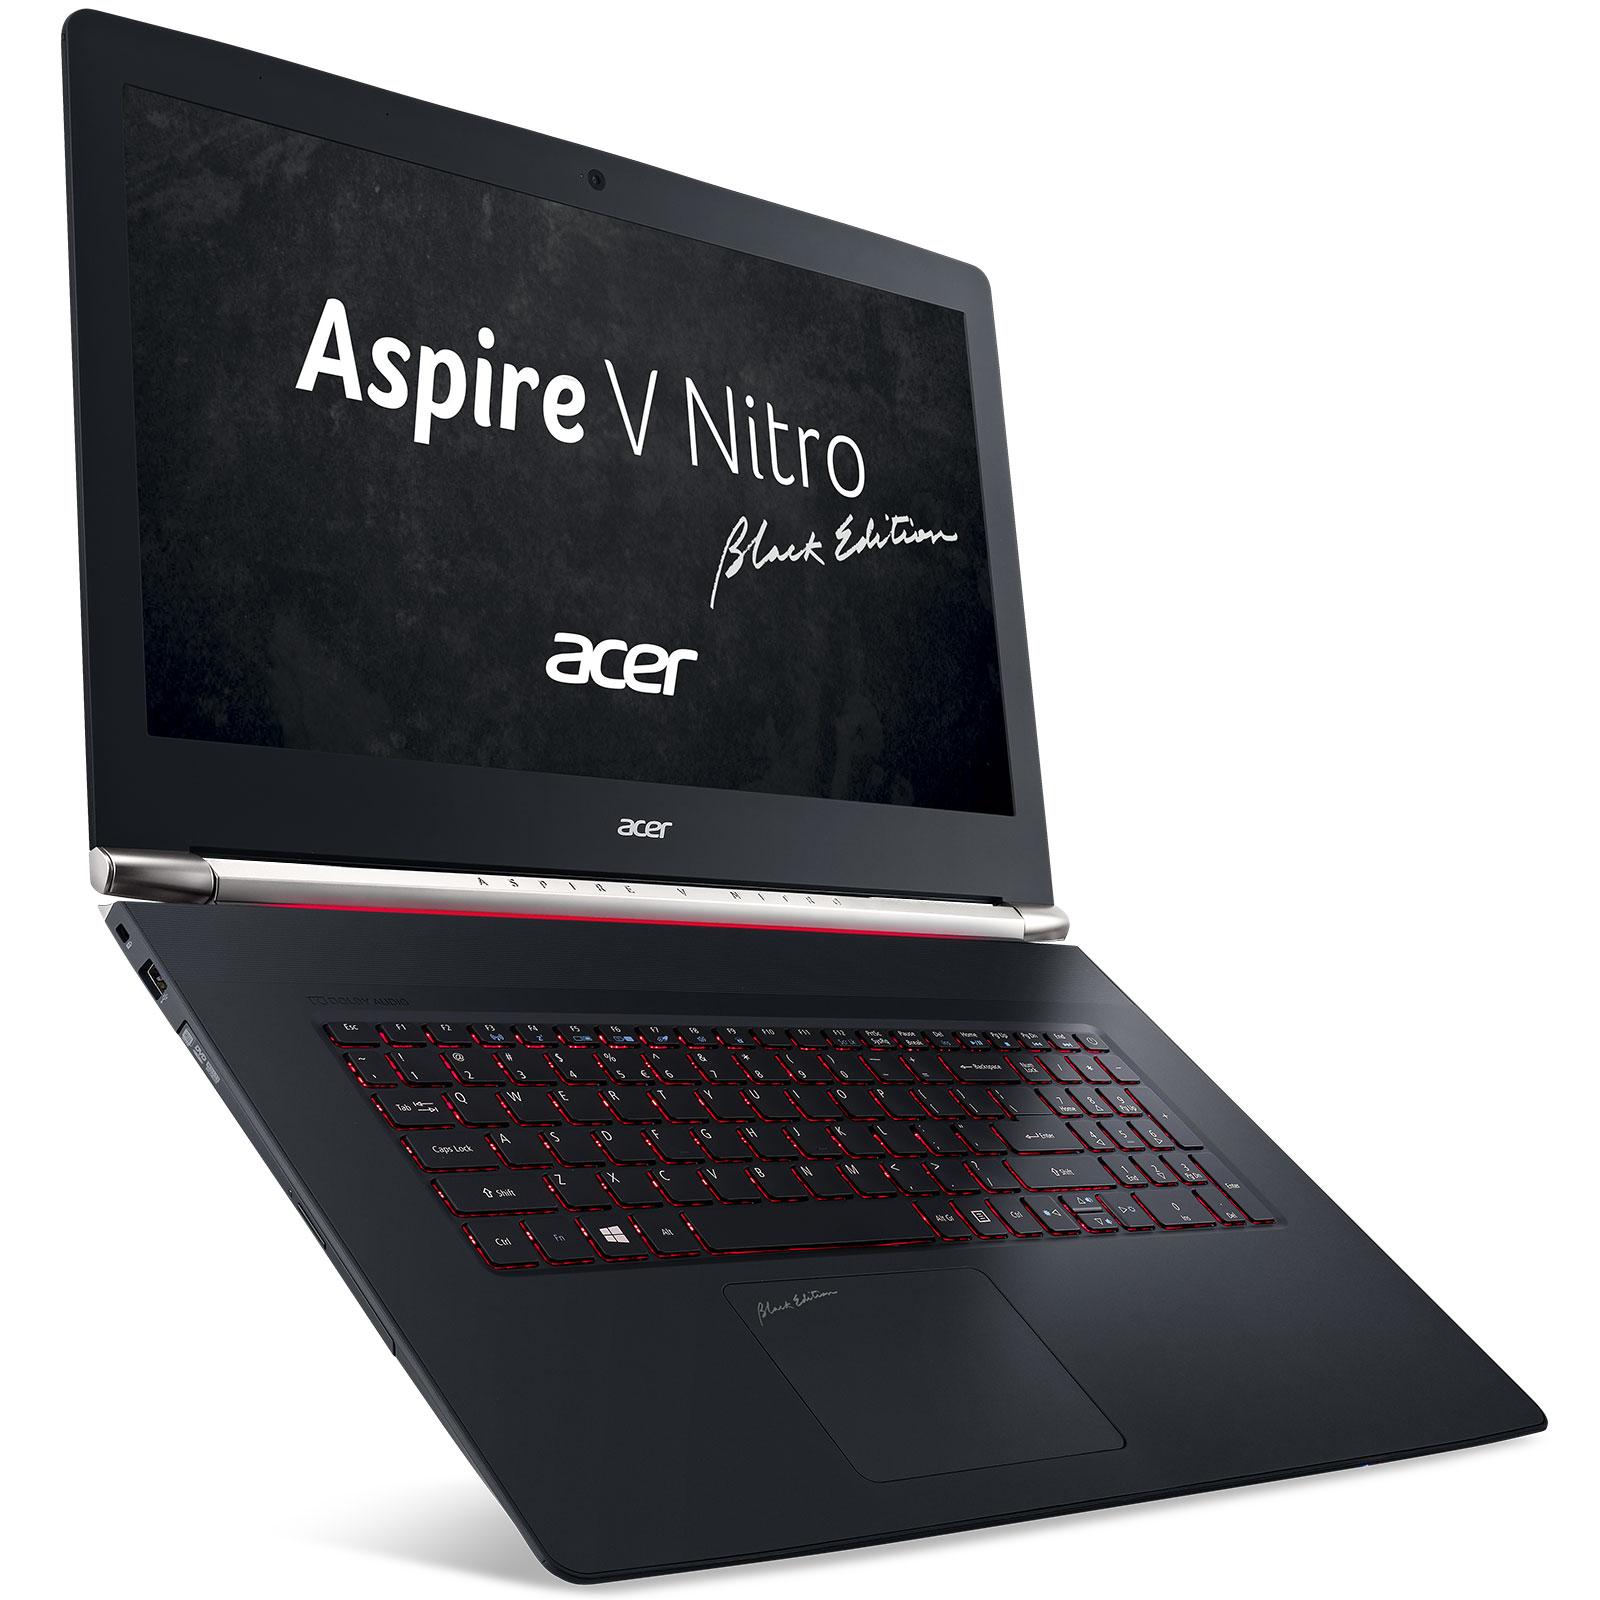 "PC portable Acer Aspire V Nitro VN7-792G-51LP Black Edition Intel Core i5-6300HQ 8 Go 1 To 17.3"" LED Full HD NVIDIA GeForce GTX 960M Wi-Fi AC/Bluetooth Webcam Windows 10 Famille 64 bits"